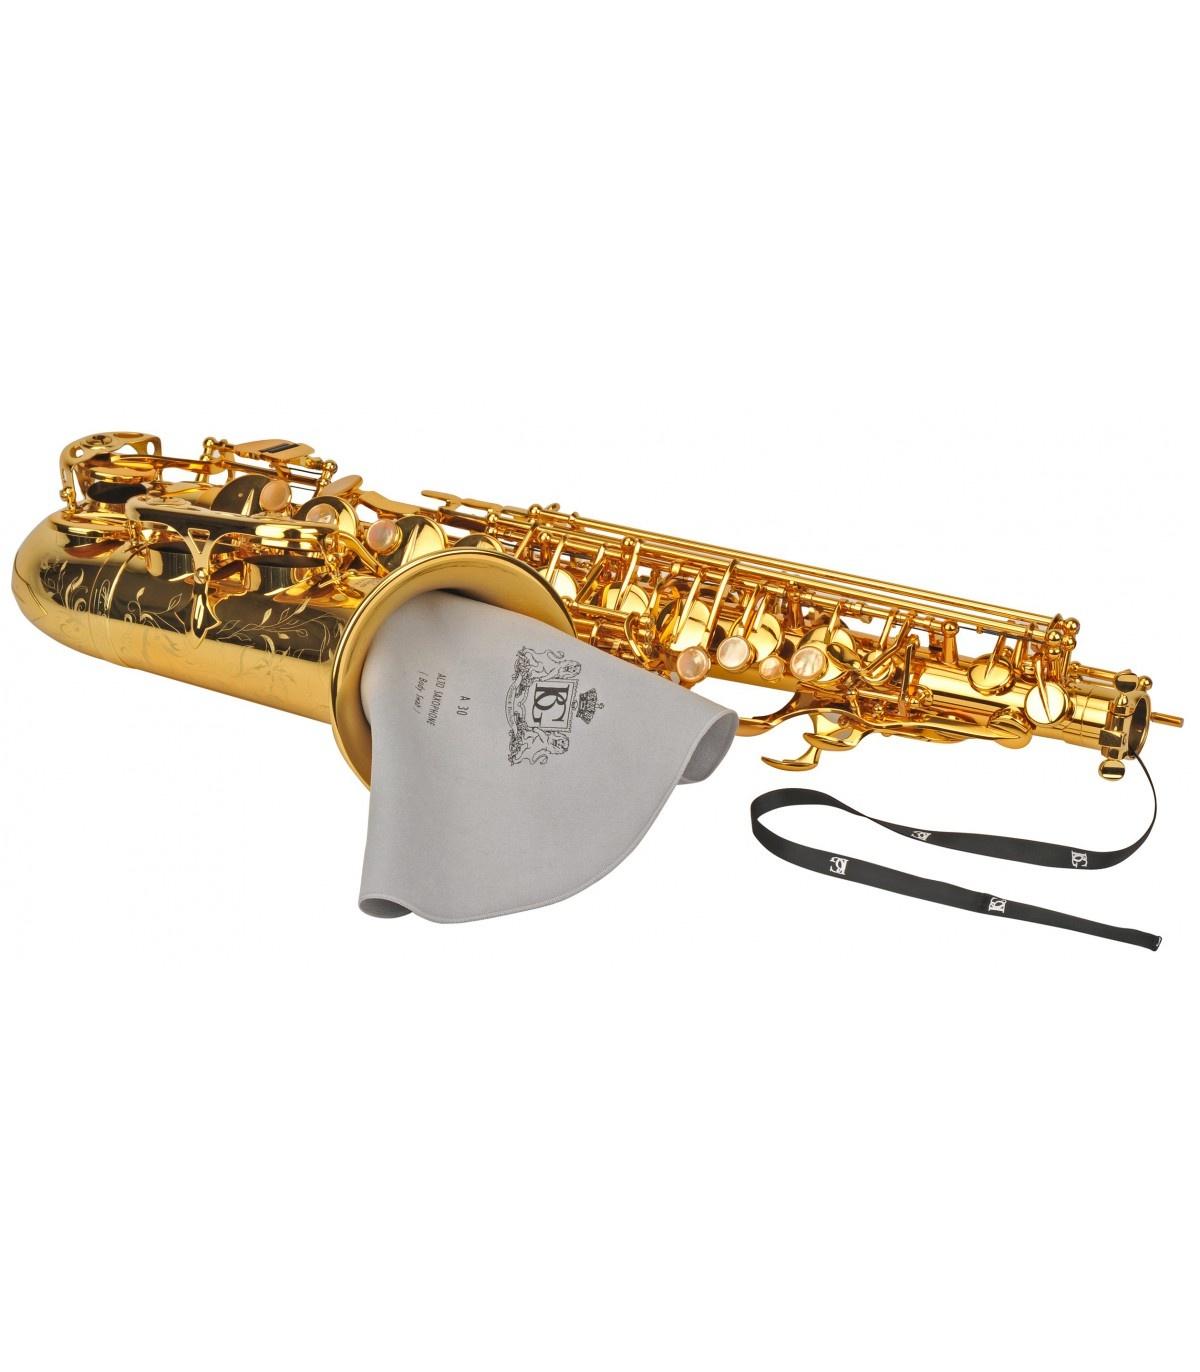 BG BG Alto Saxophone Body Swab - Microfiber